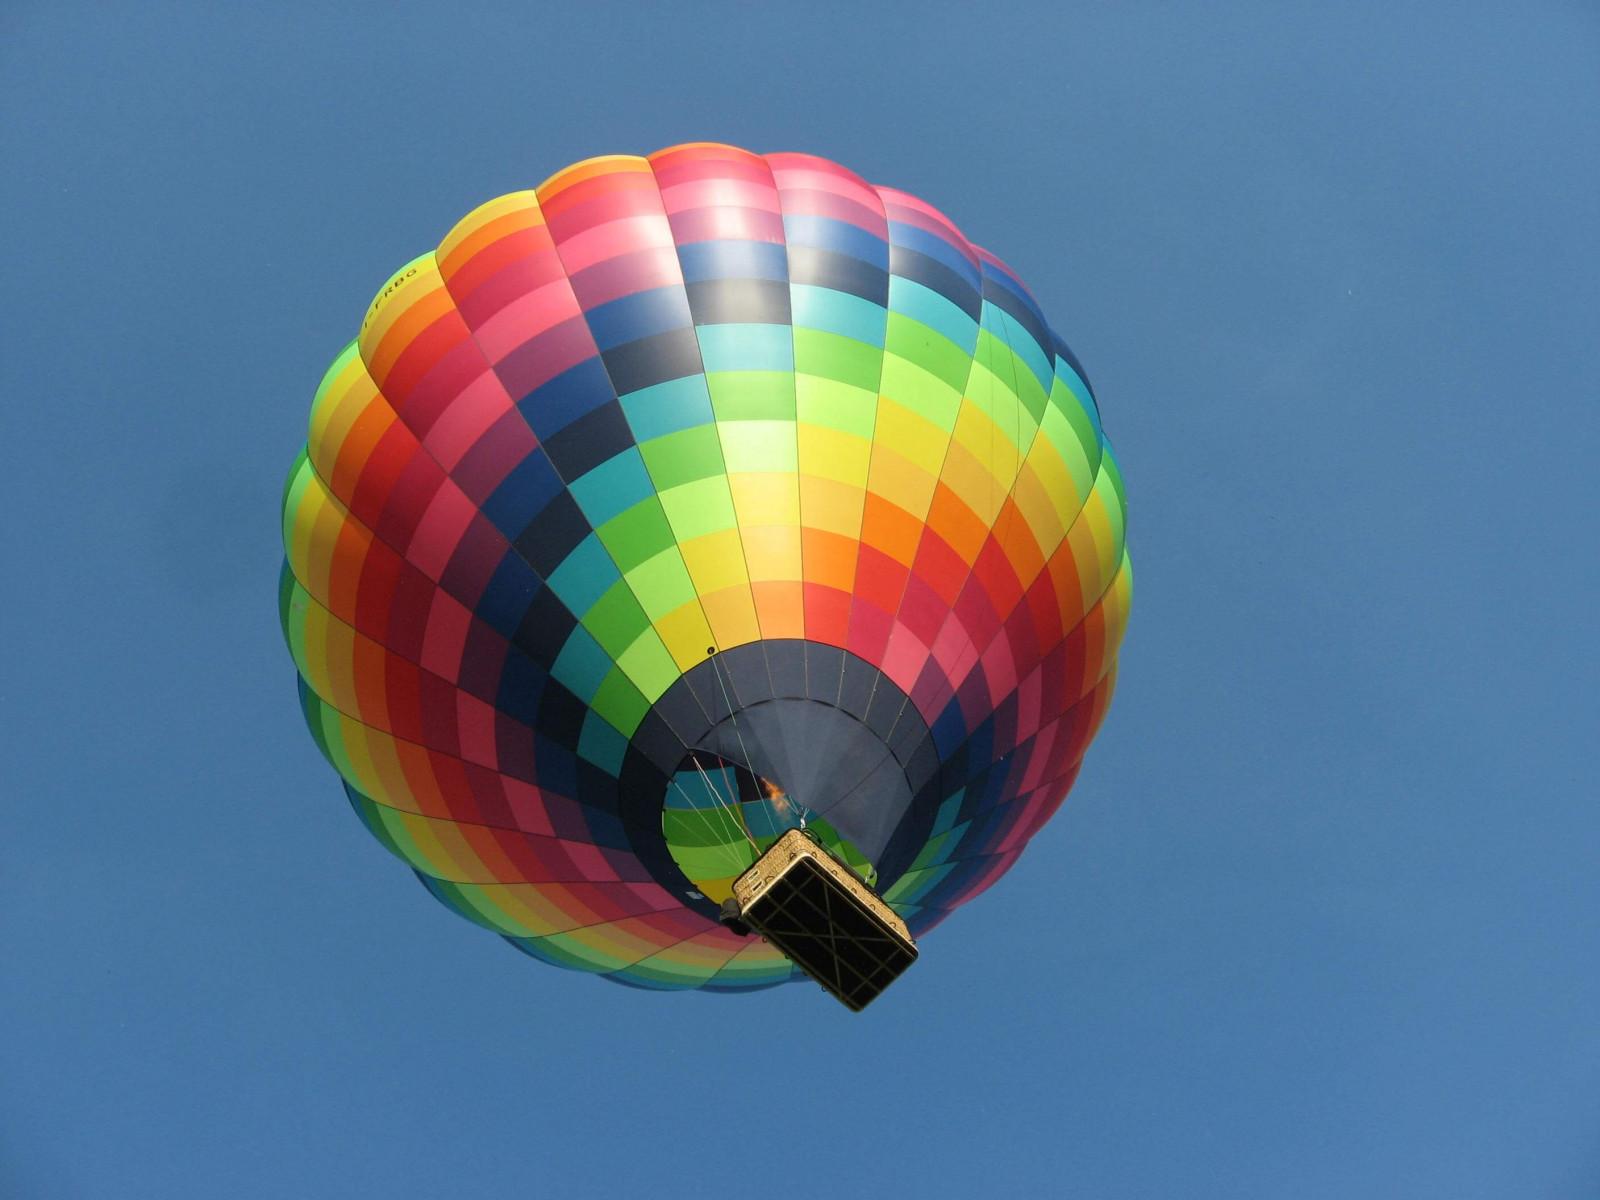 Volo in mongolfiera a San Colombano al Lambro (Milano)